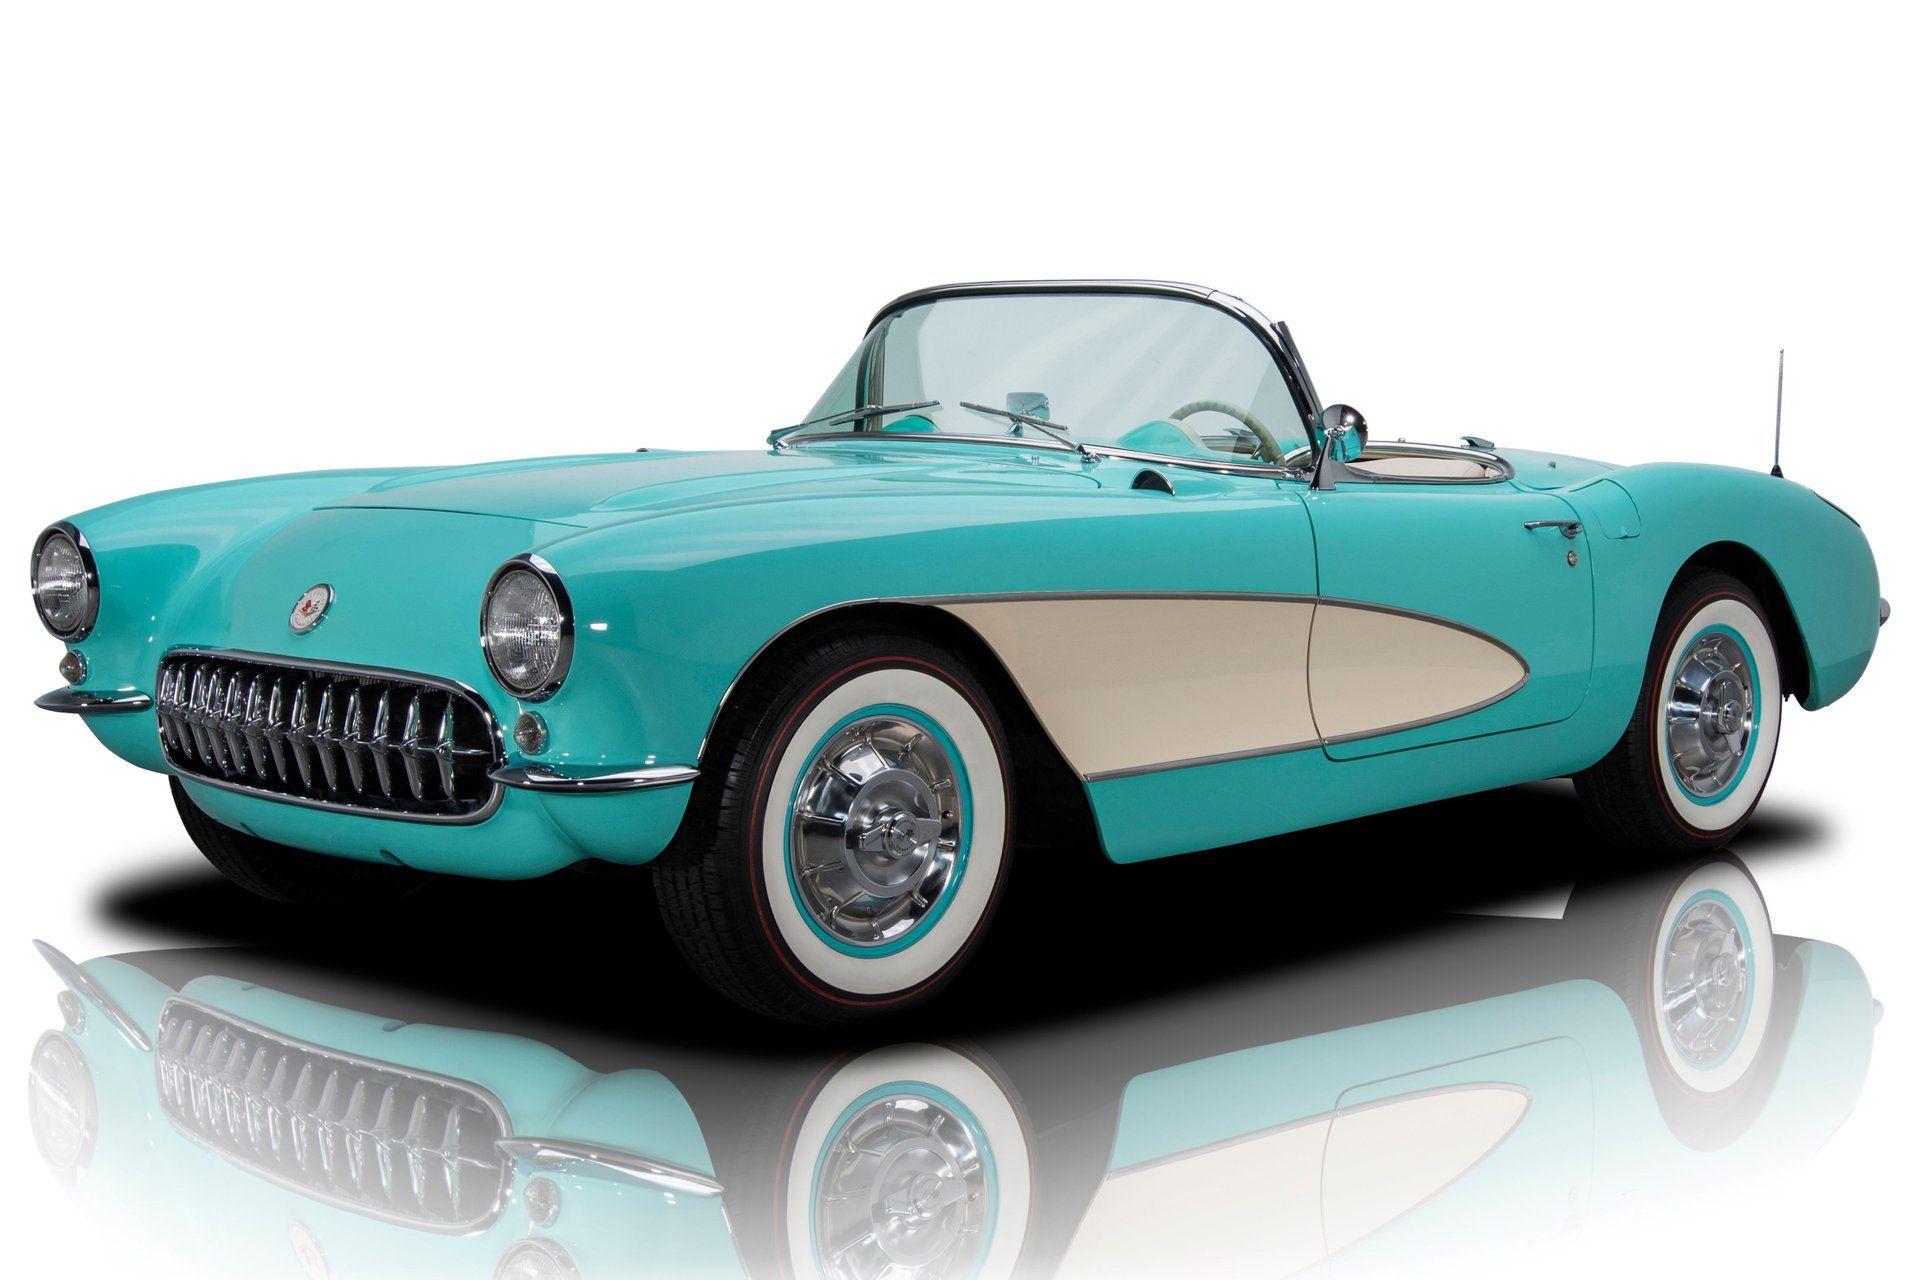 "<img src=""1956-chevrolet-corvette.jpeg"" alt=""A 1956 Chevy Corvette restomod"">"